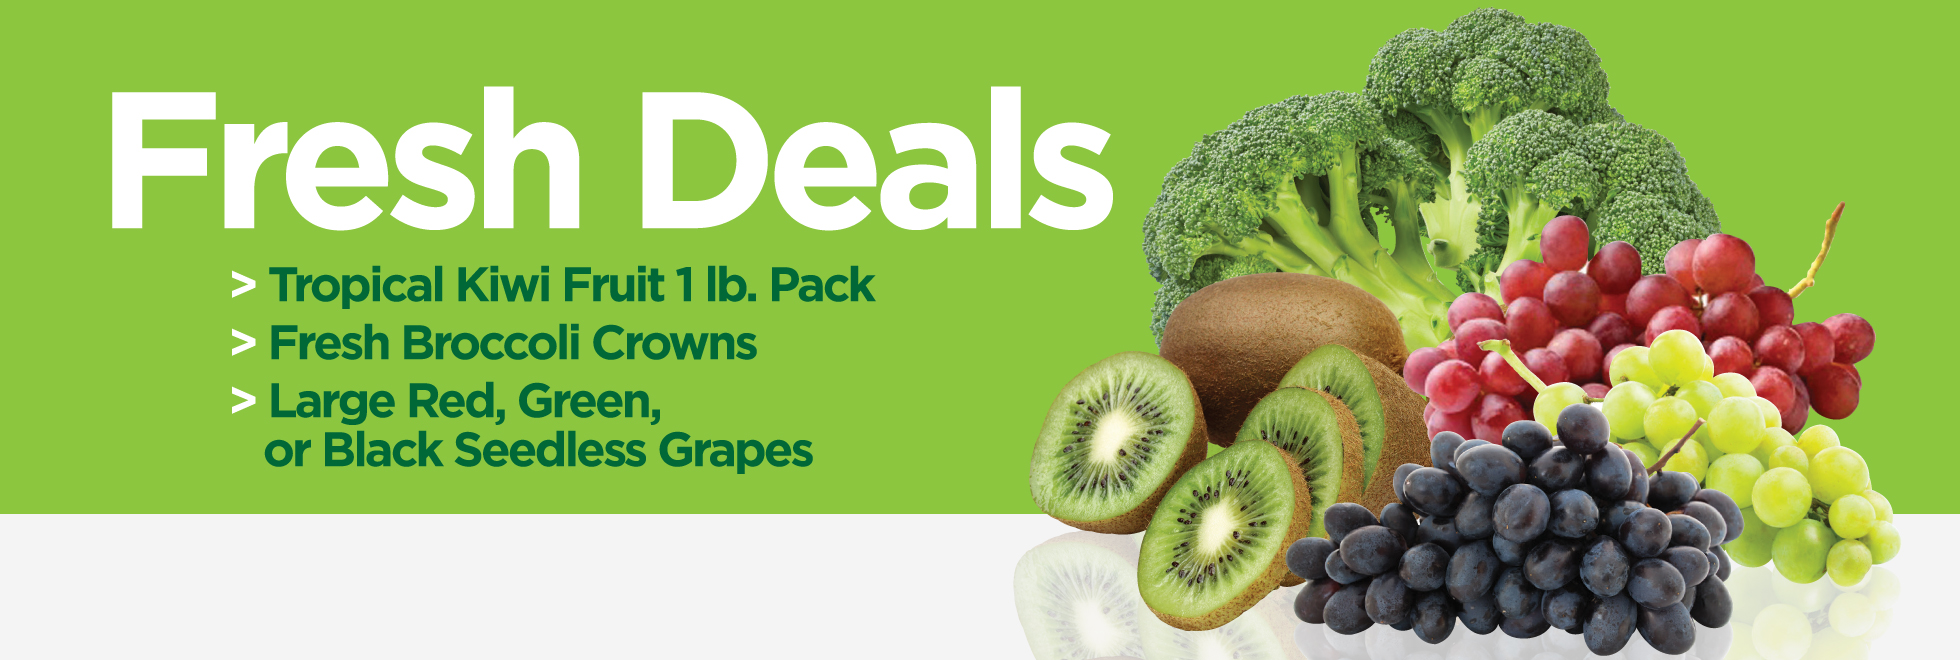 Best Deals in Town Fresh Produce